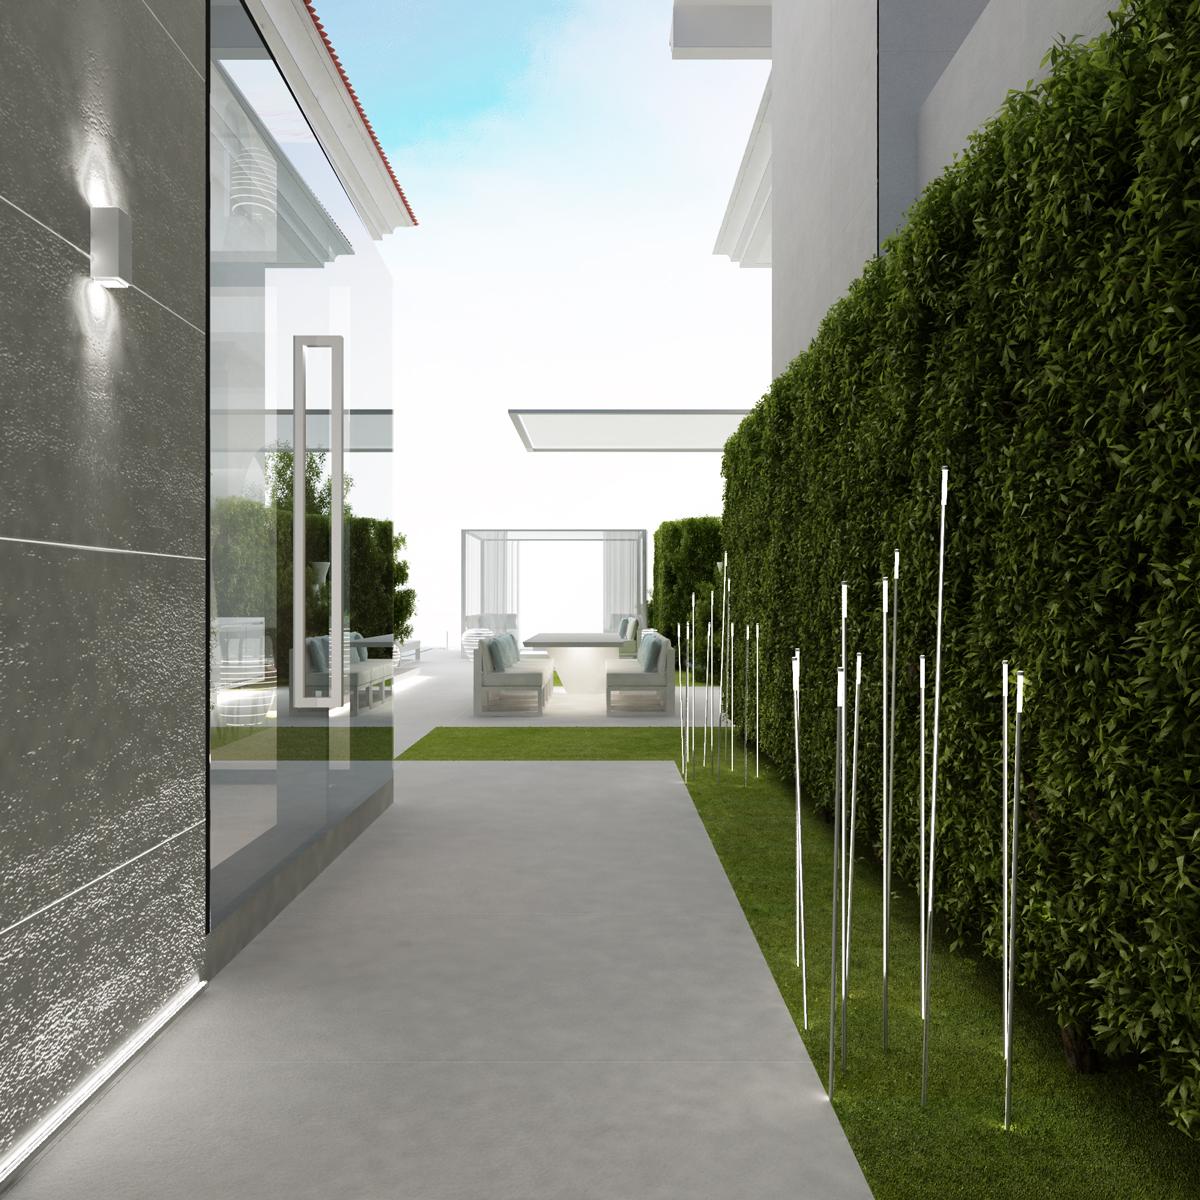 Villa Design - Exterior  Concept